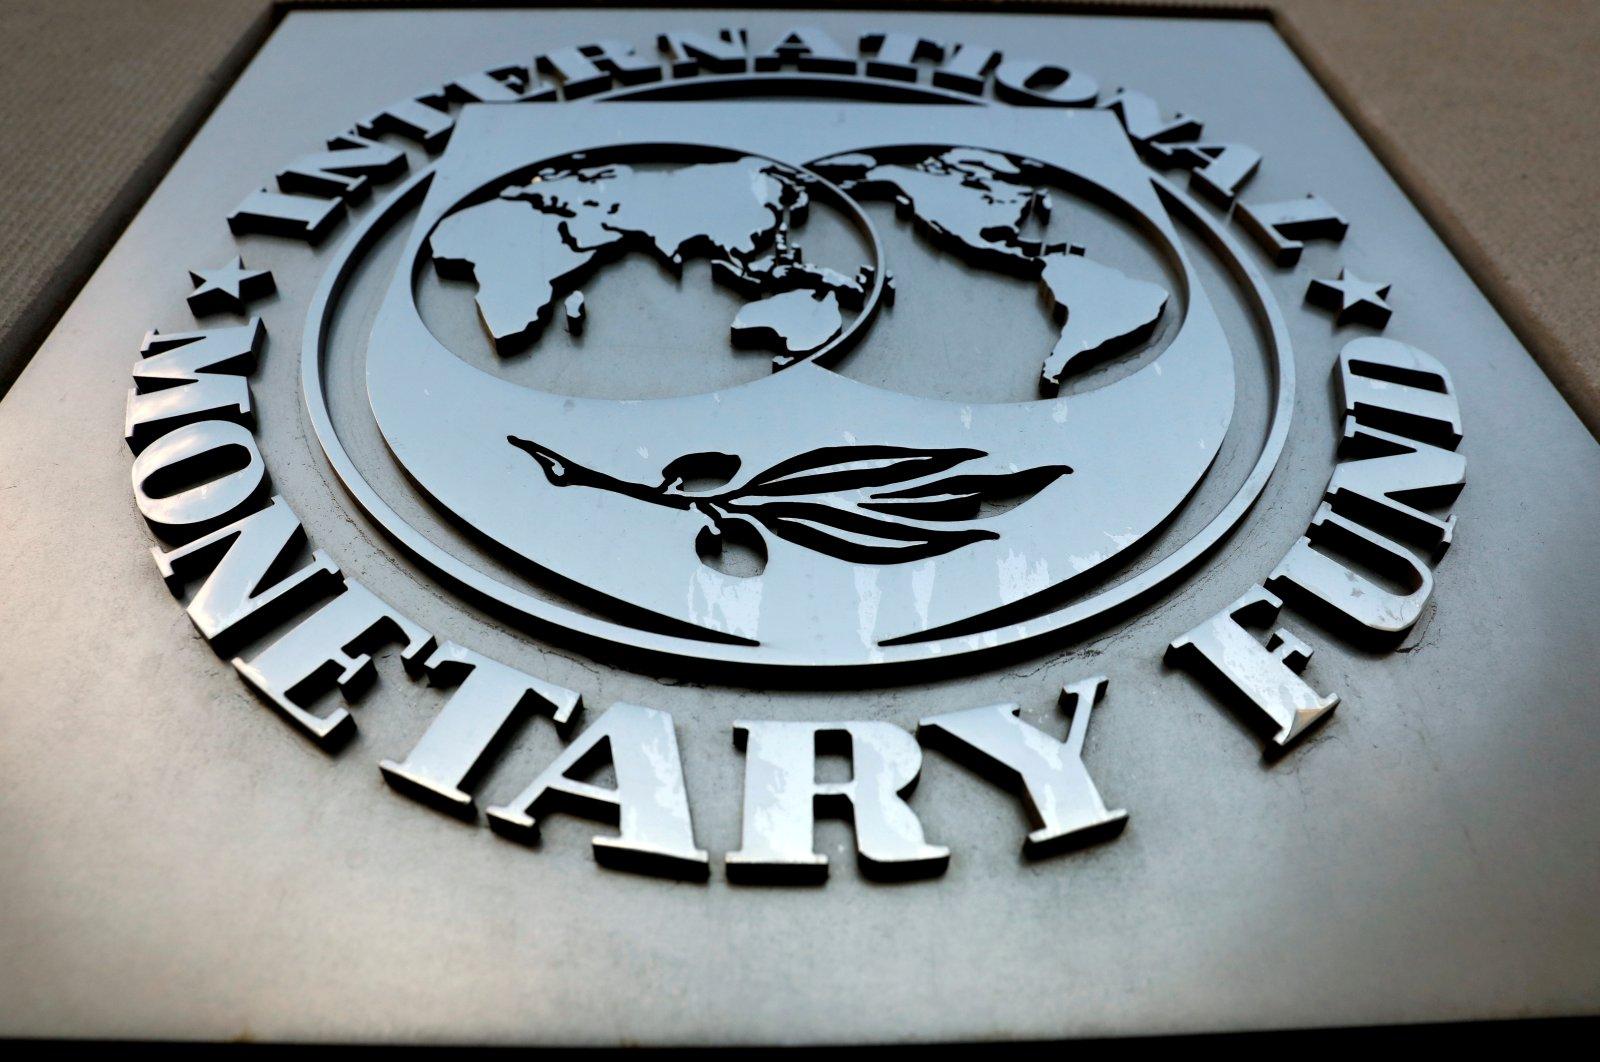 The International Monetary Fund (IMF) logo outside their headquarters in Washington, D.C., the U.S., Sep. 4, 2018. (Reuters Photo)